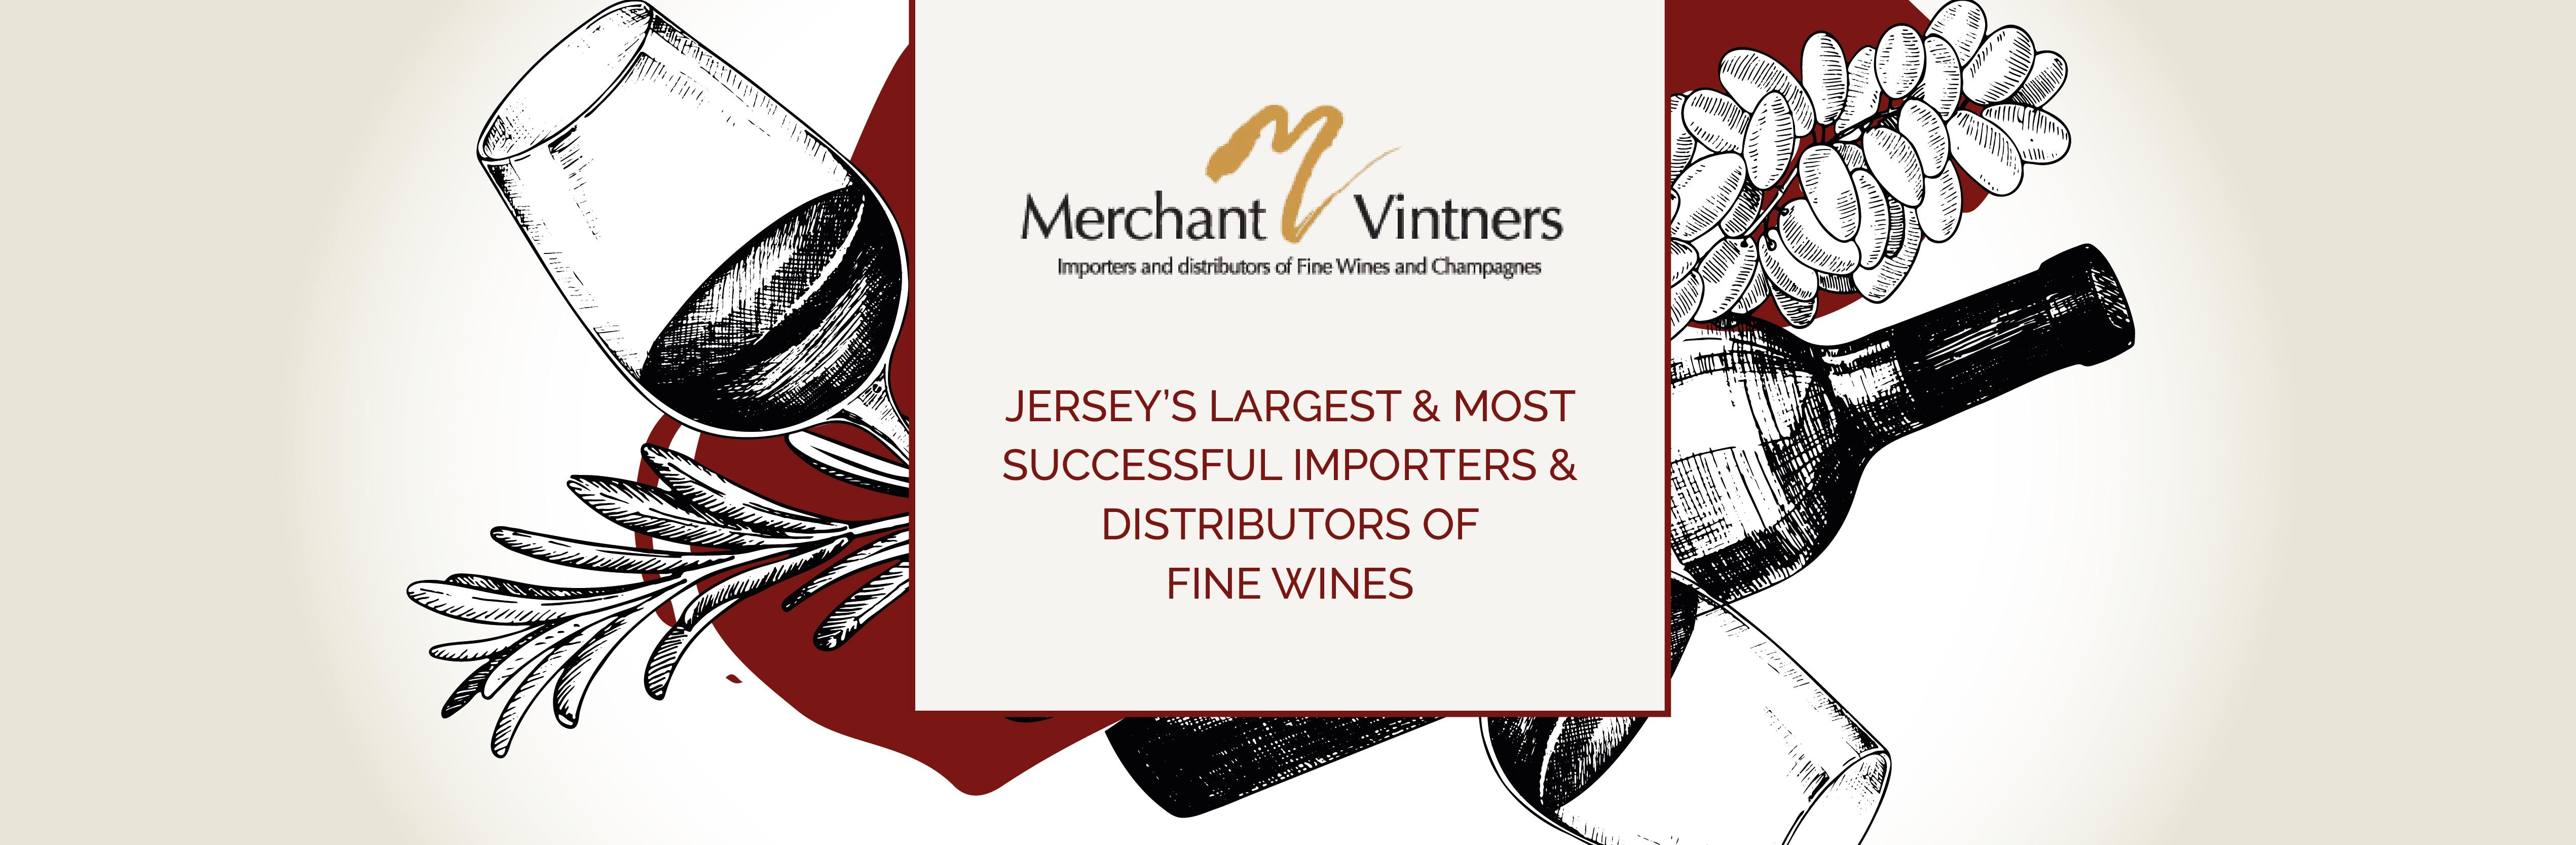 Merchant Vintners Jersey